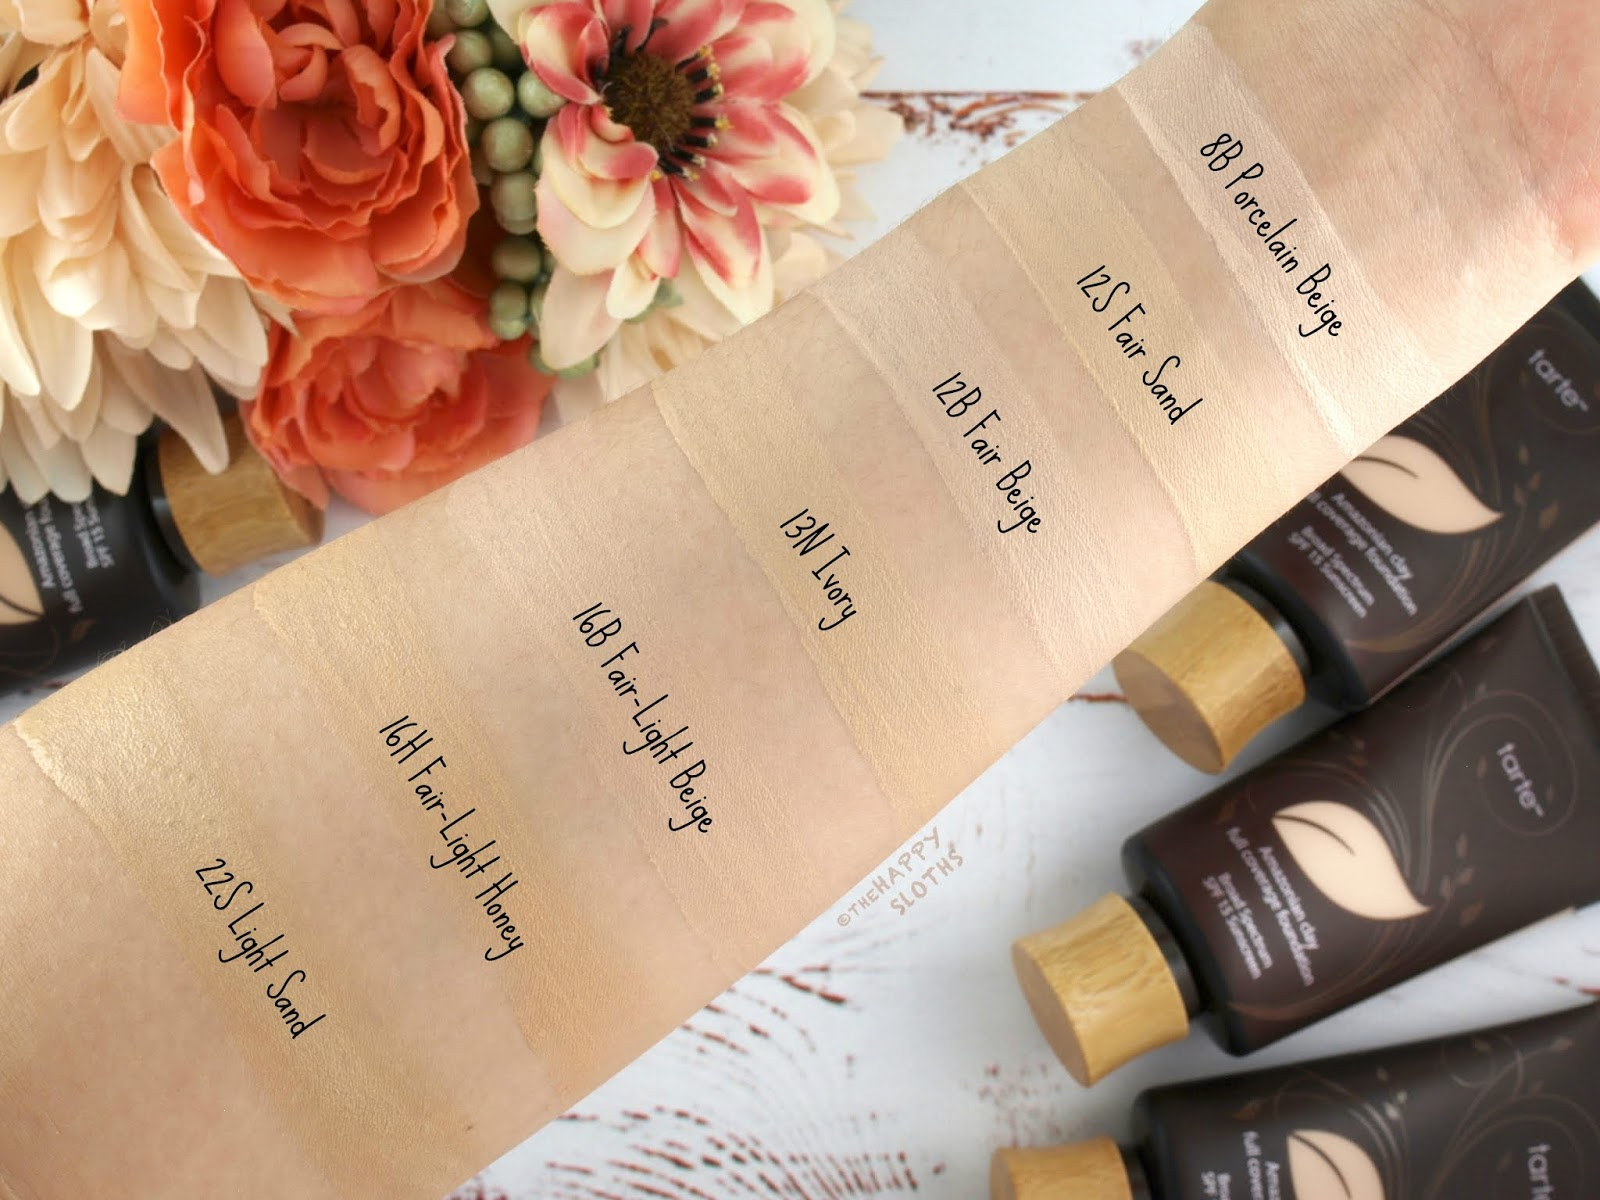 tarte amazonian clay stick foundation review